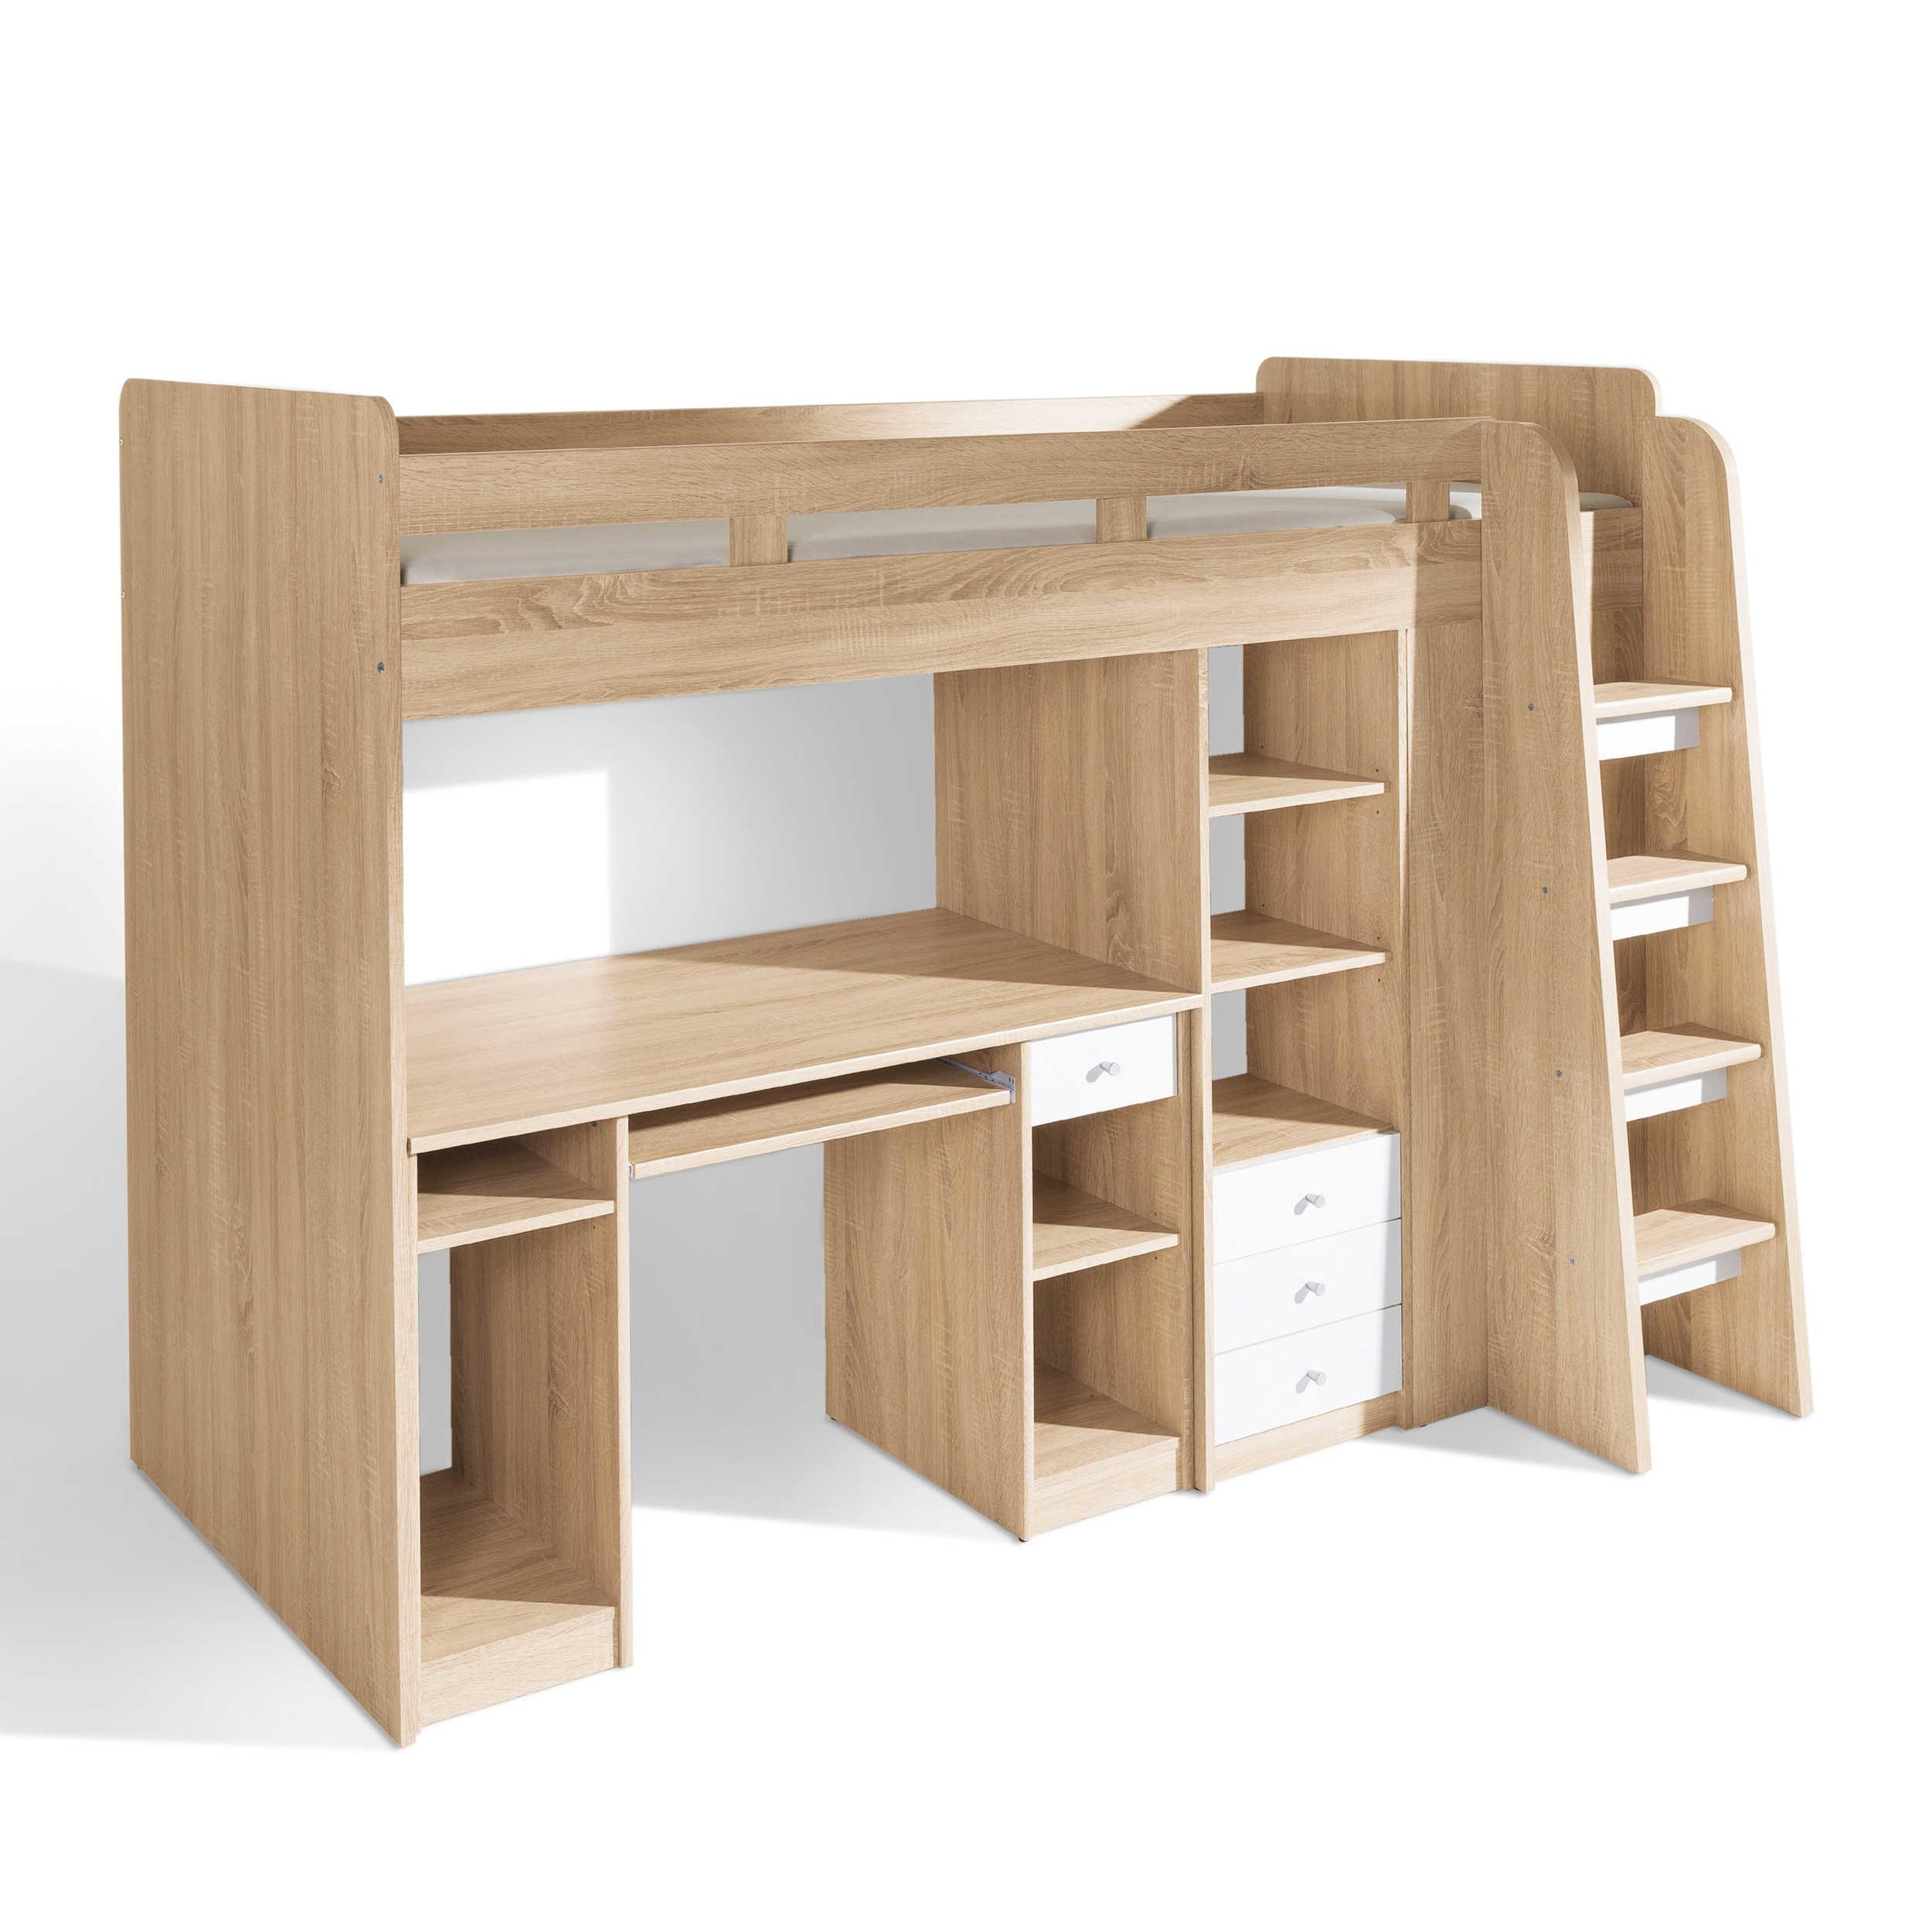 pol power hochbett unit 90 x 200 cm eiche holzoptik online. Black Bedroom Furniture Sets. Home Design Ideas